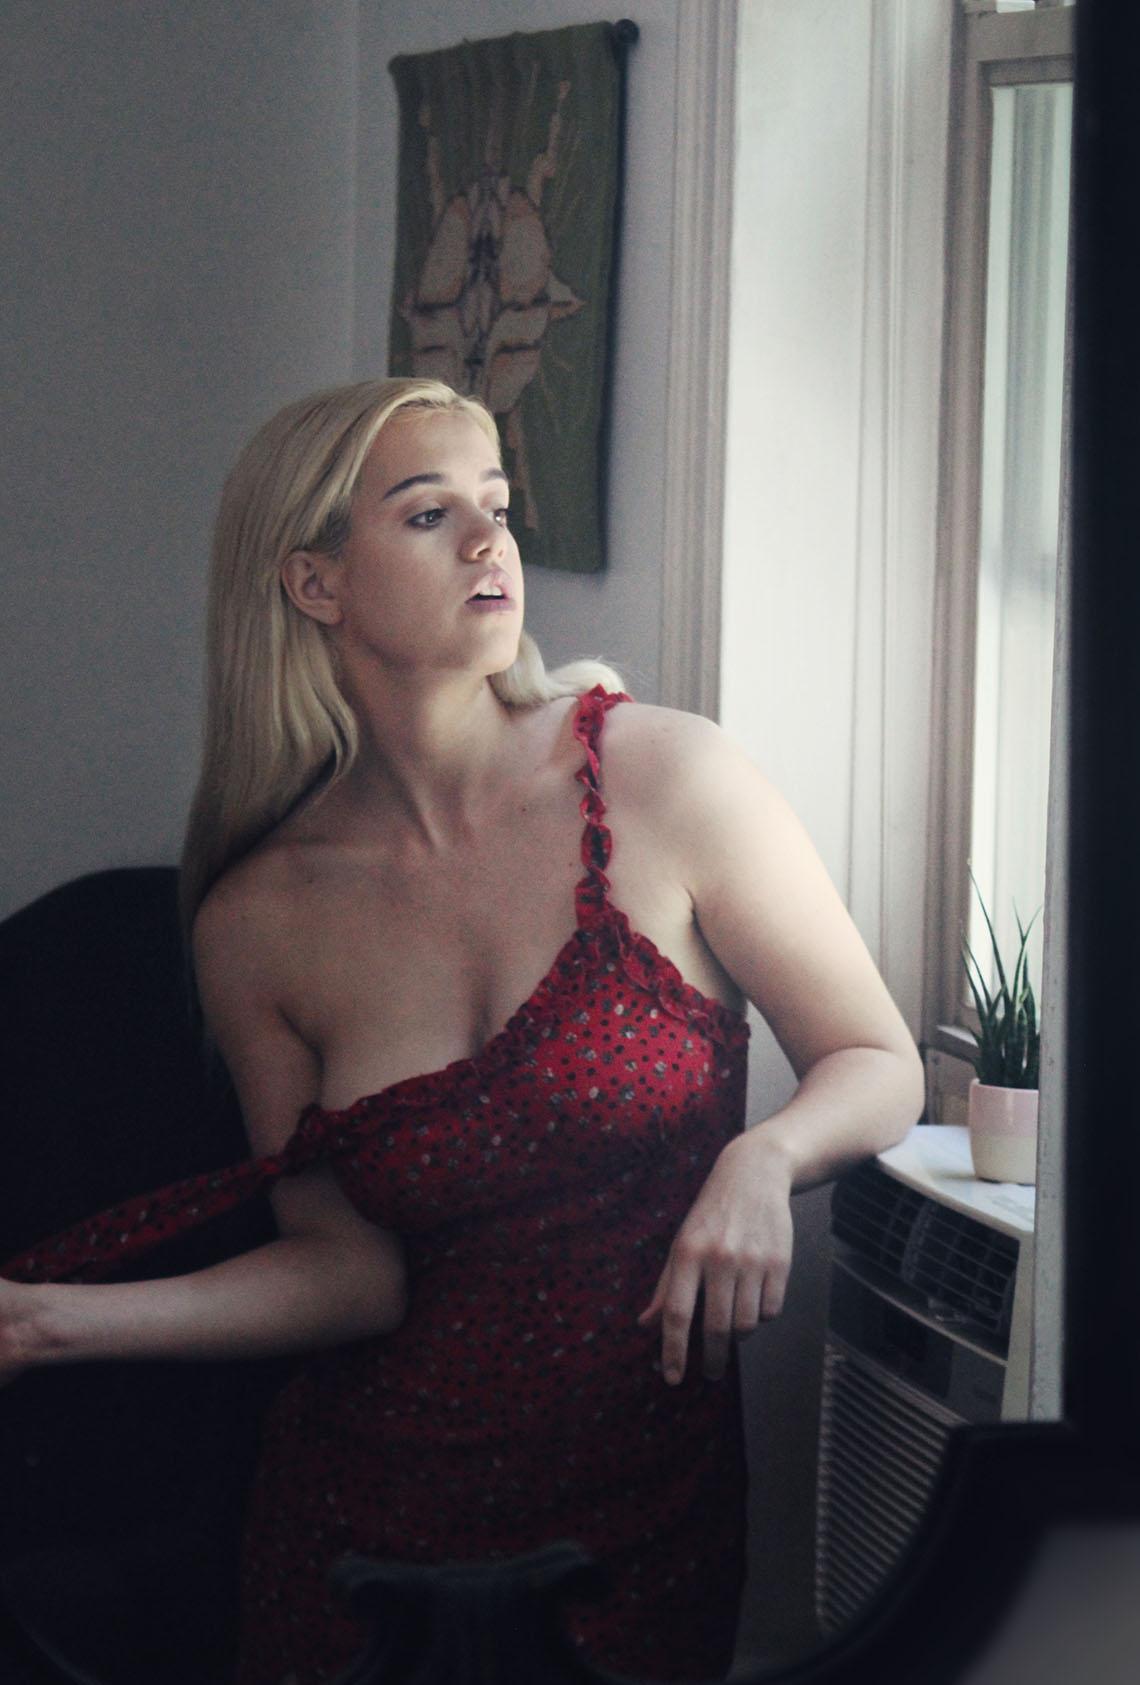 photographer Tim Goodwin / model Peach Kennedy